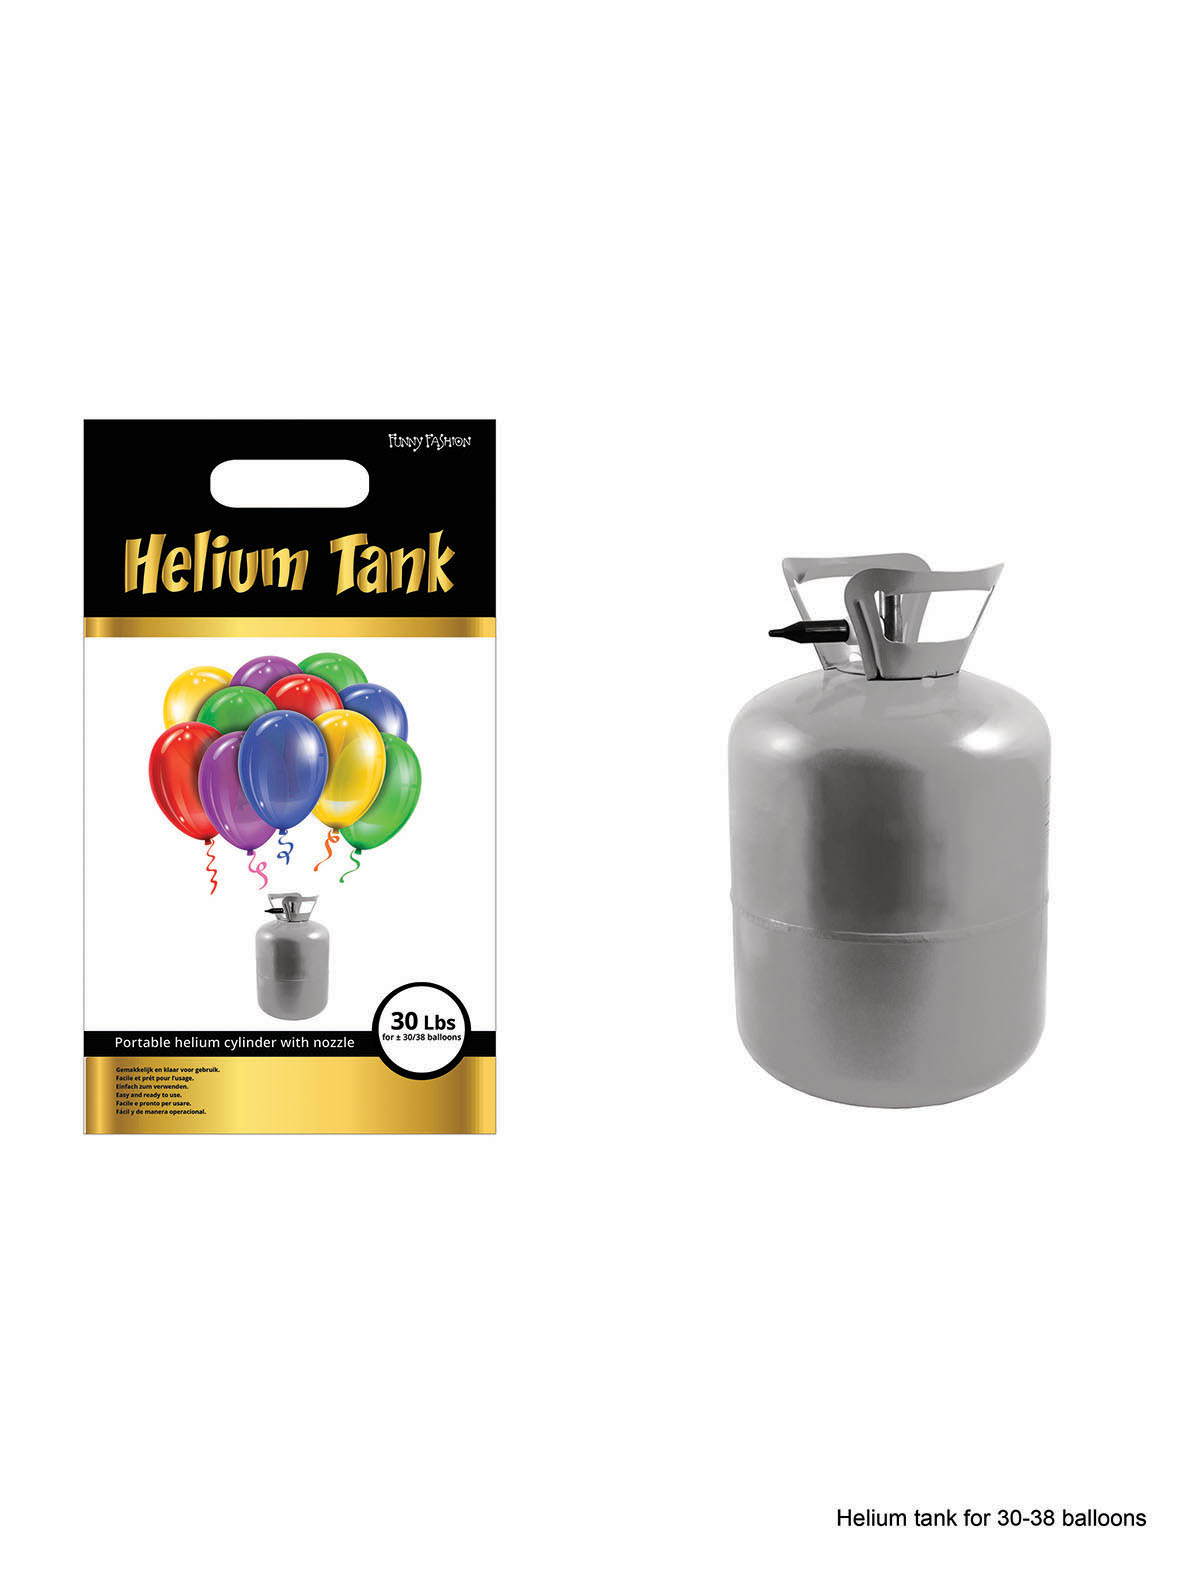 Luftballonhelium für 30 Ballons (ohne Ballons) - 13,4 L